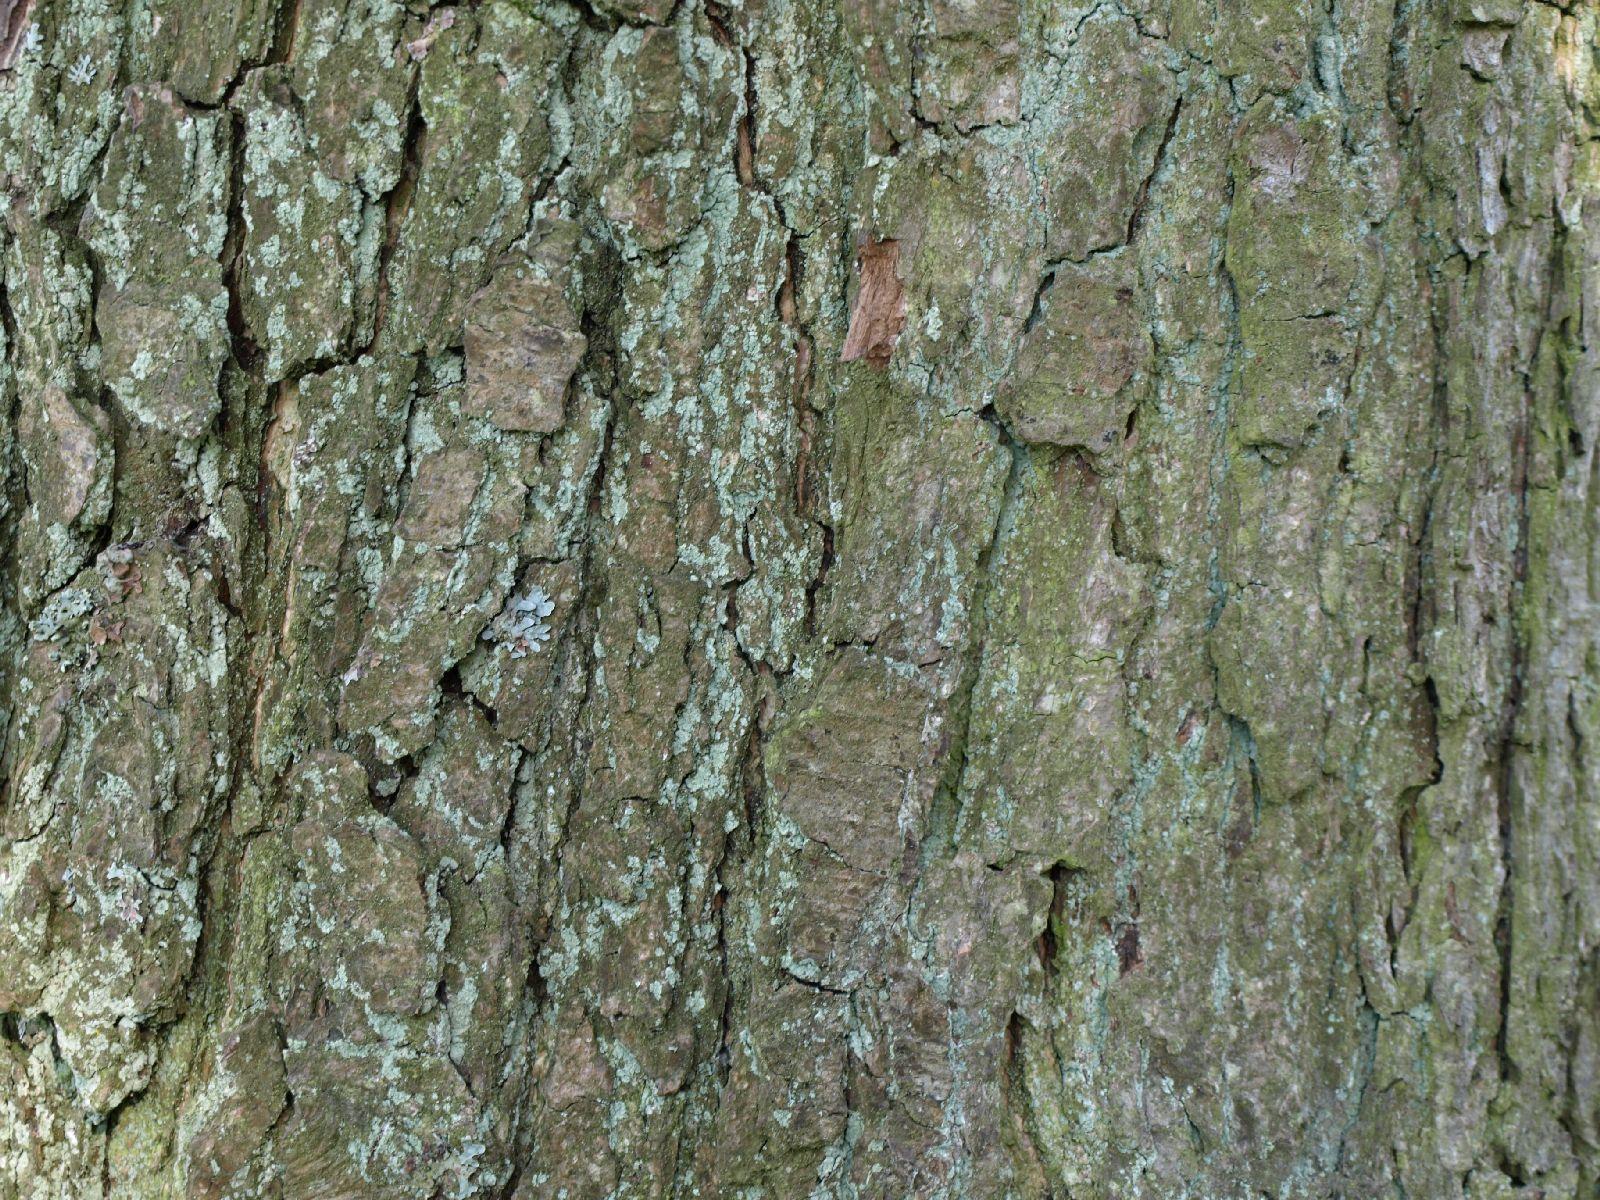 Wood_Texture_A_P5112636